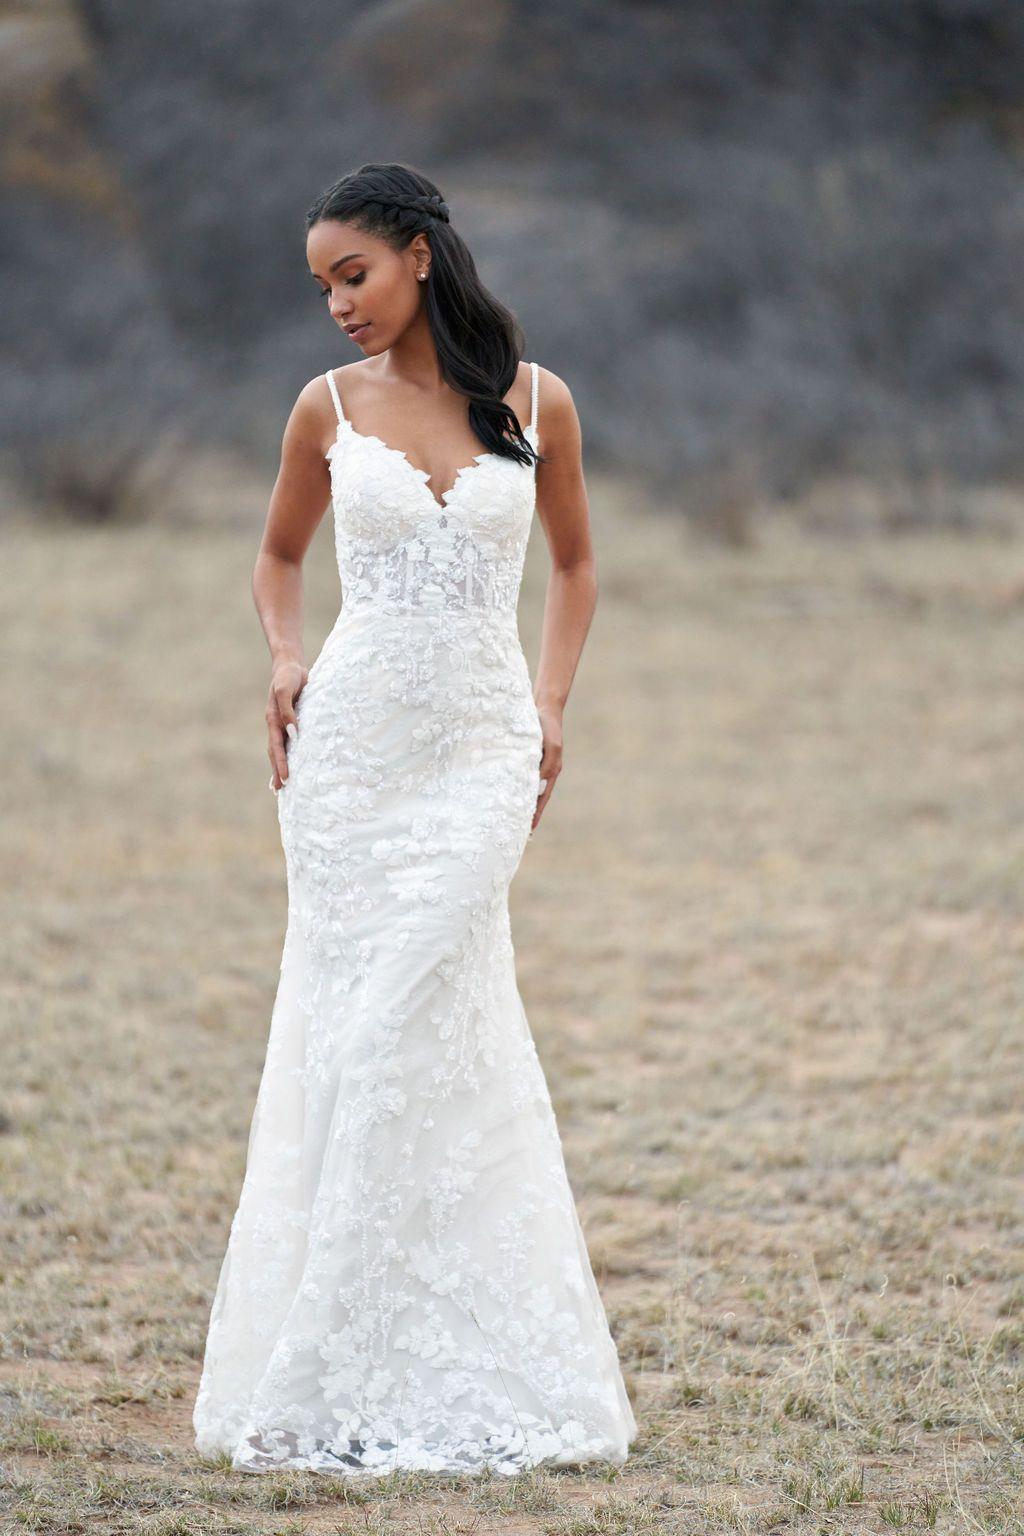 https://www.bridalreflections.com/wp-content/uploads/2020/11/9765-AD2.jpg